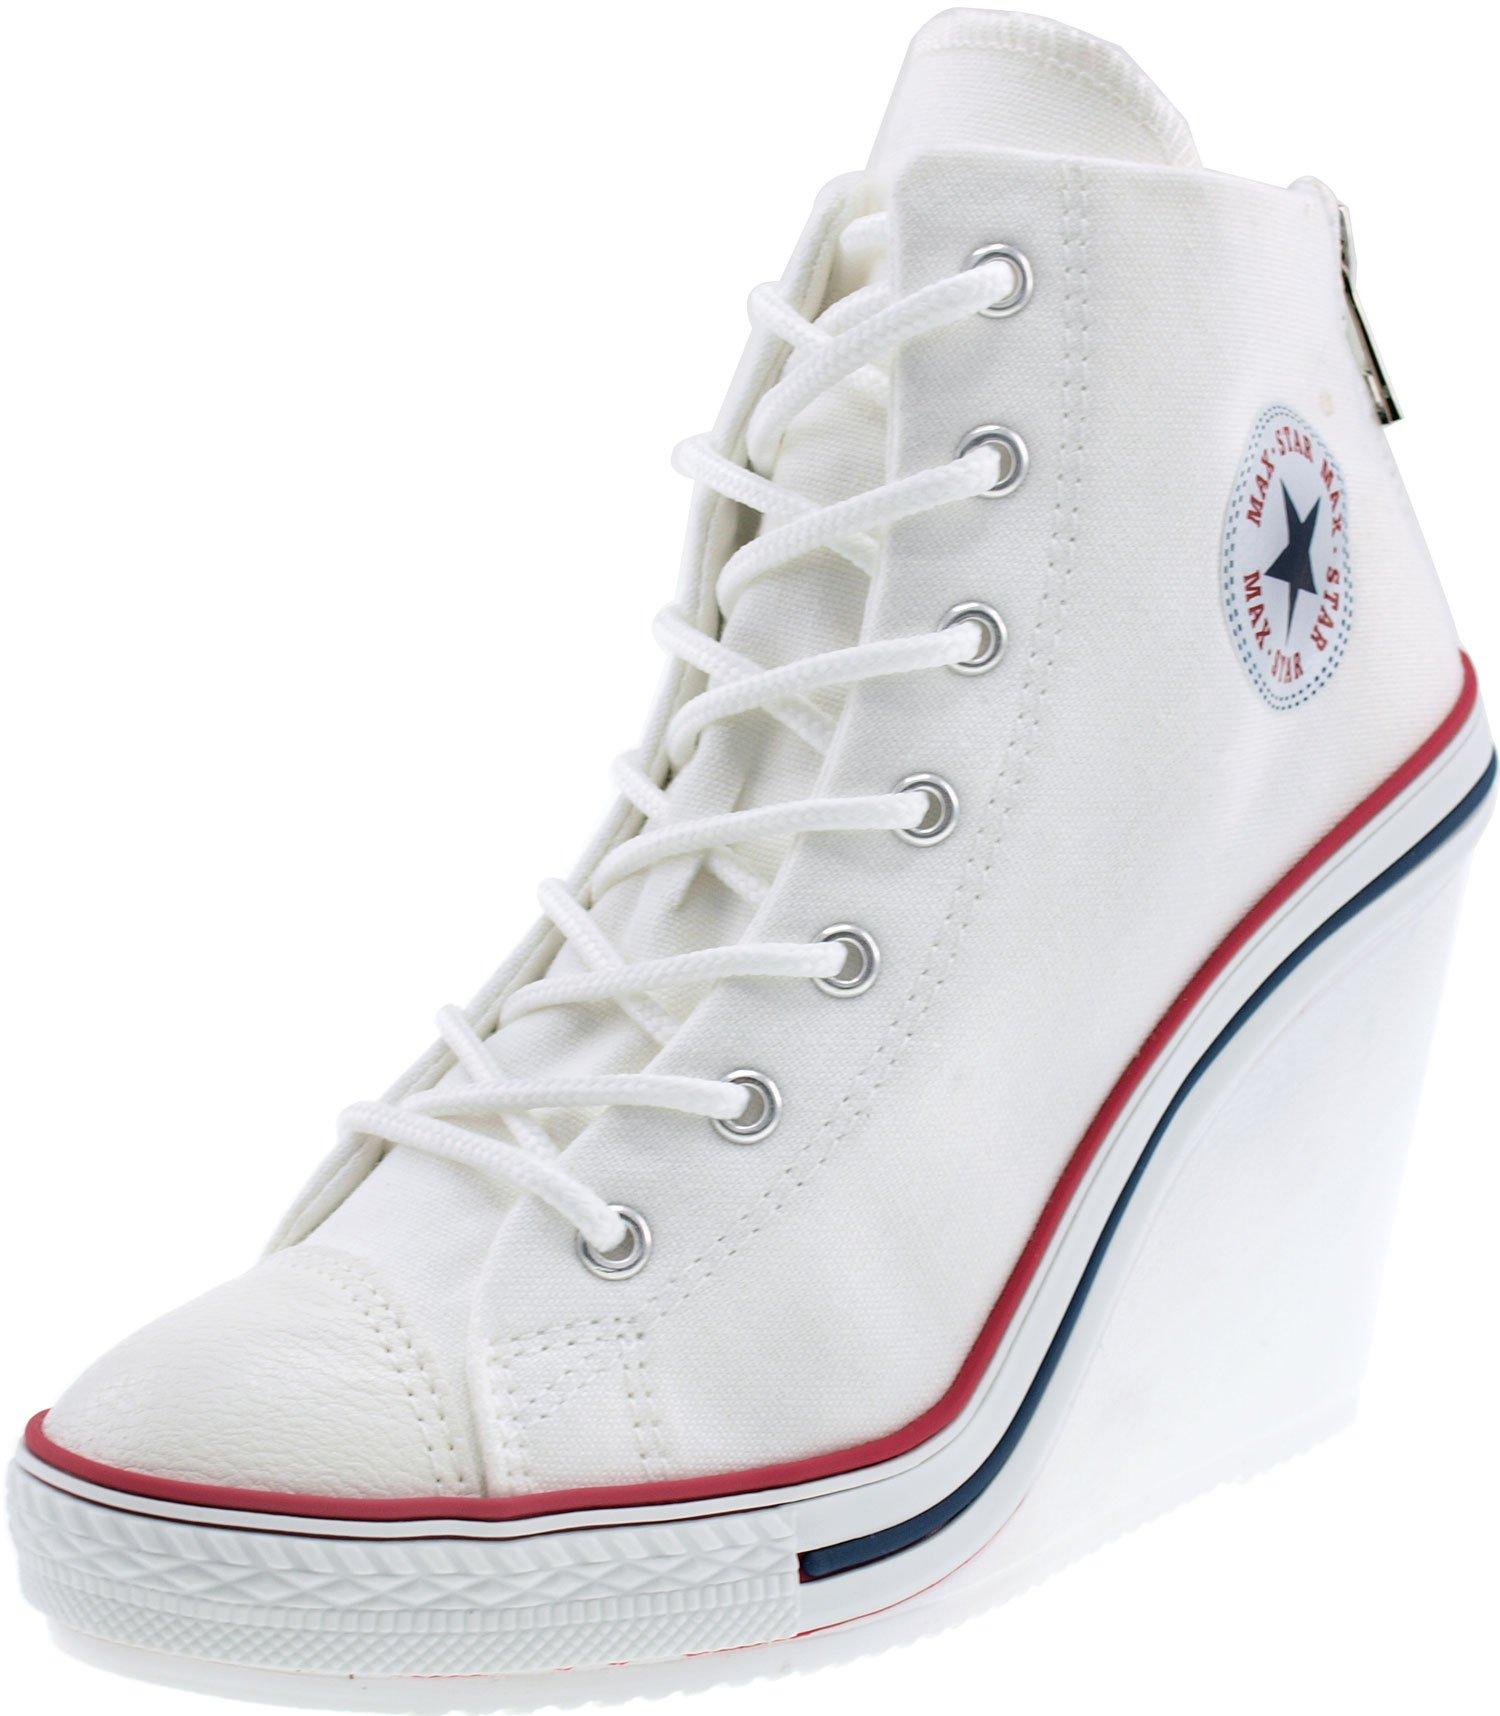 Maxstar Women's 777 Back Zipper Canvas High Wedge Heel Sneakers White 6 B(M) US